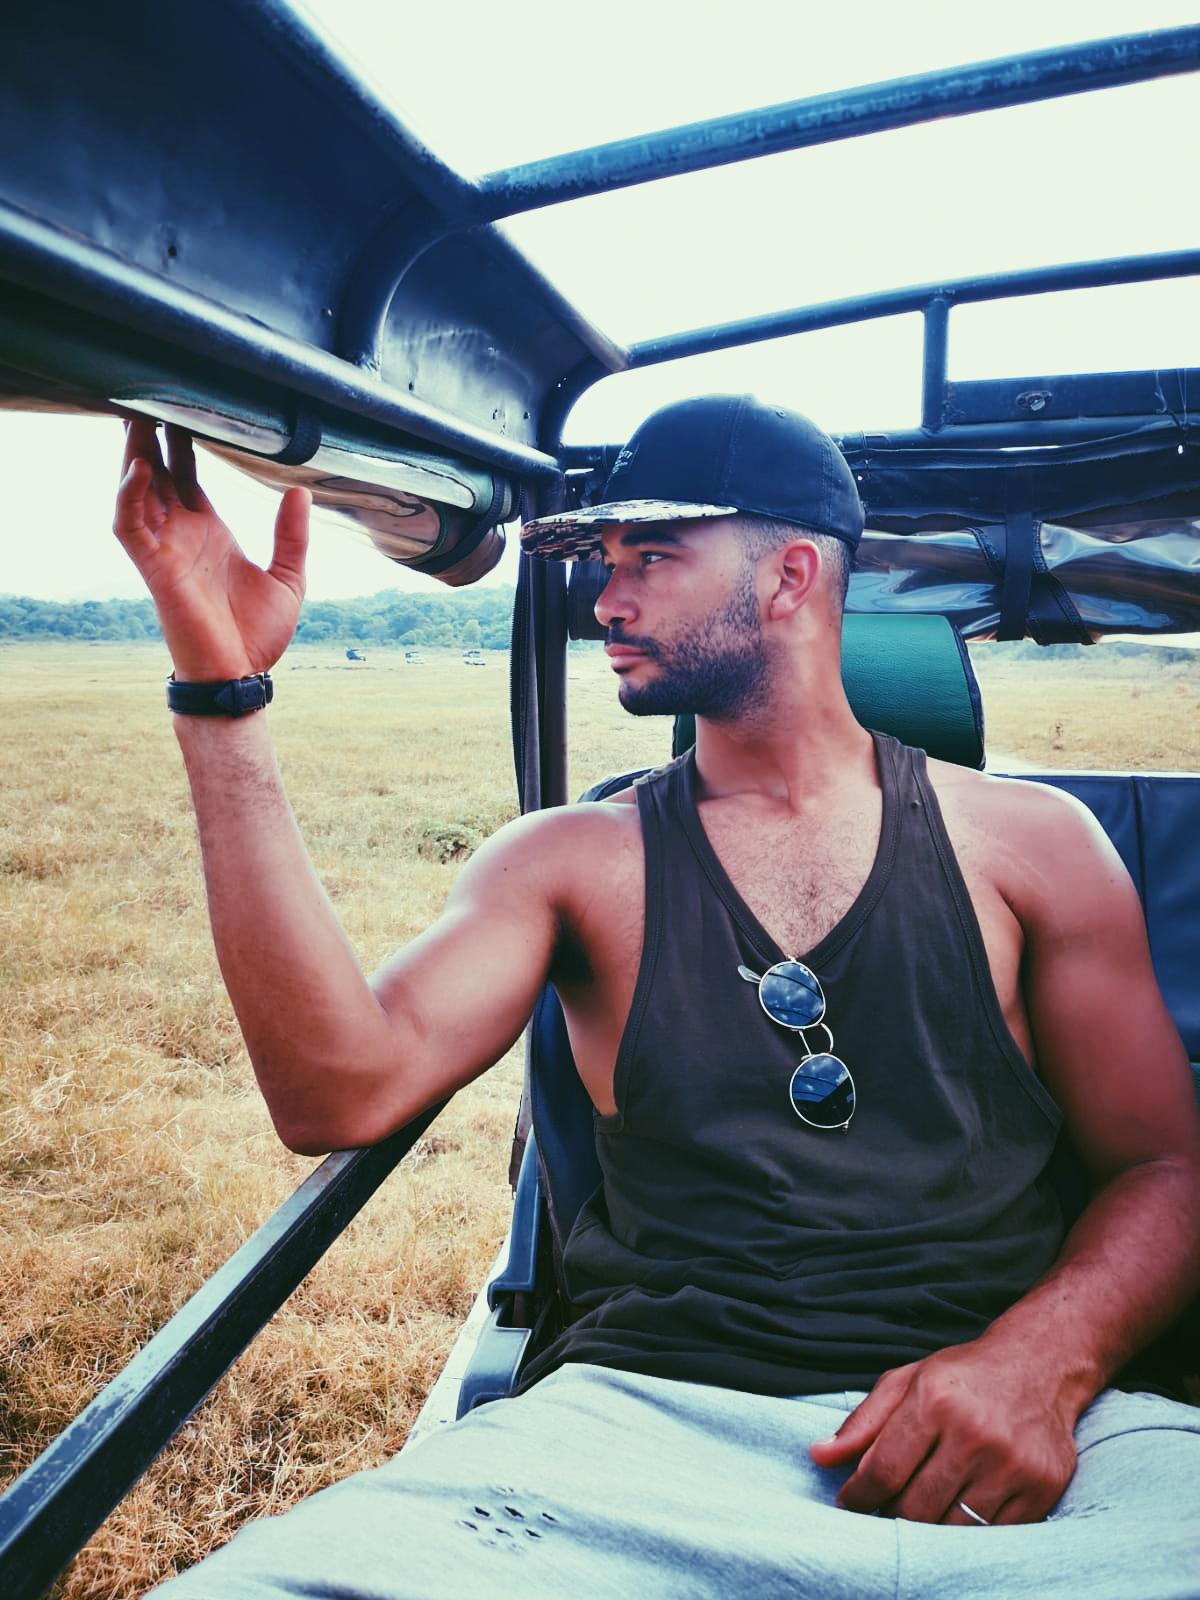 invite-to-paradise-sri-lanka-holiday-honeymoon-specialists-customer-feedback-elin-jordan-luce-wildife-safari-jeep.JPG